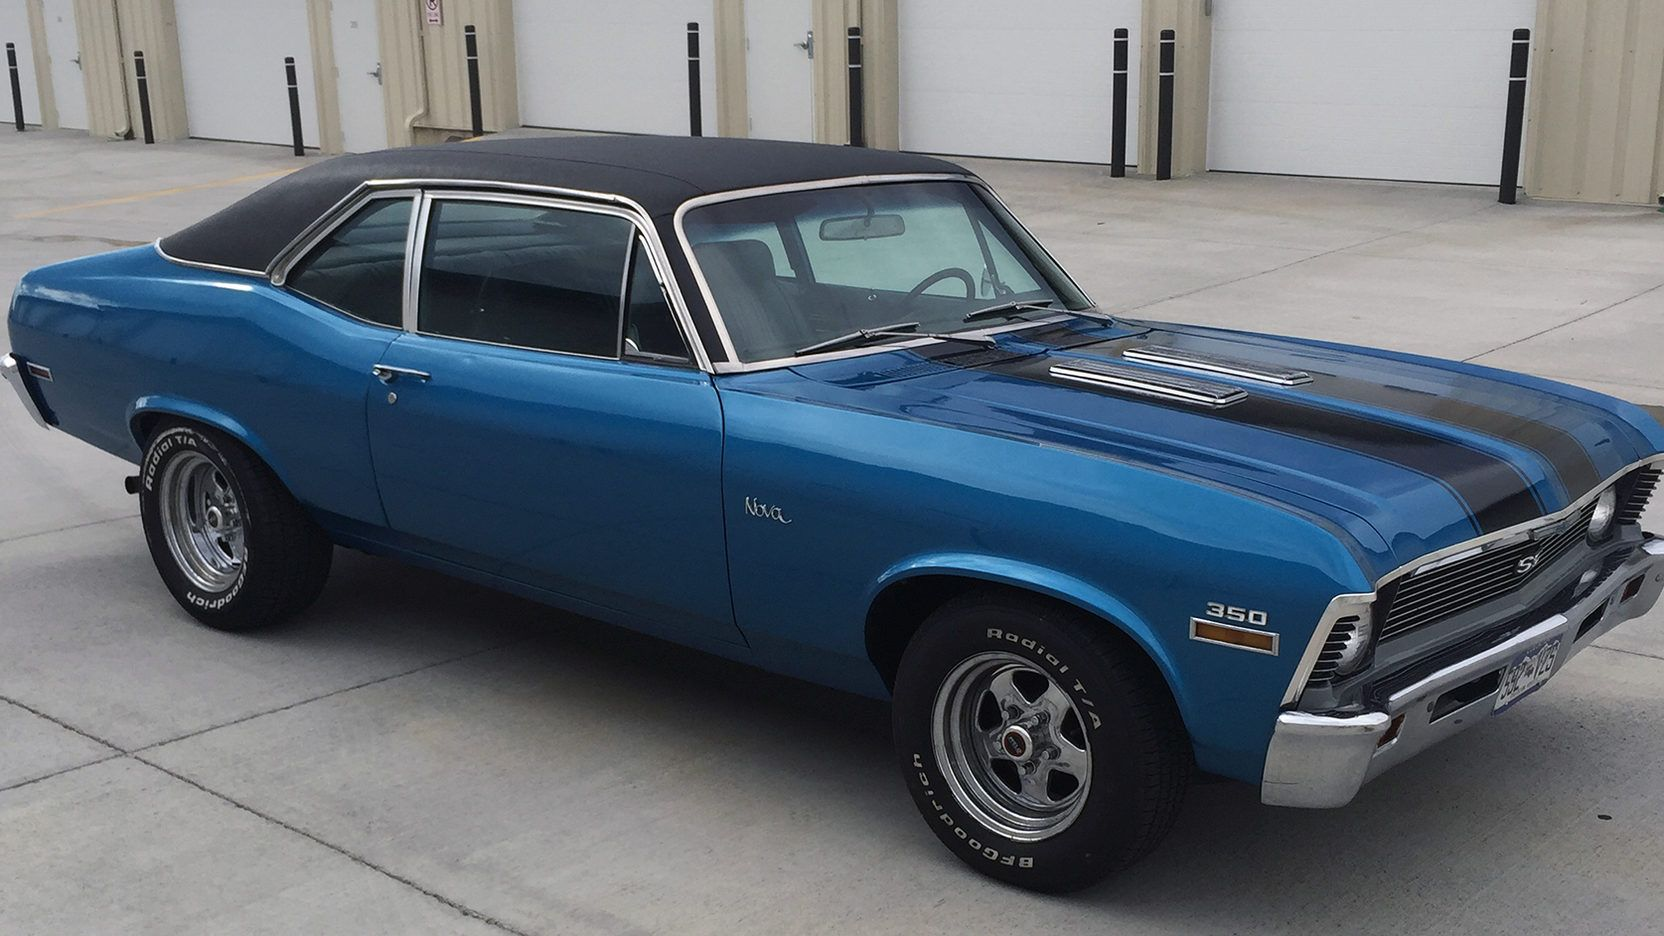 1972 Chevrolet Nova Chevrolet Nova Chevy Nova Chevrolet